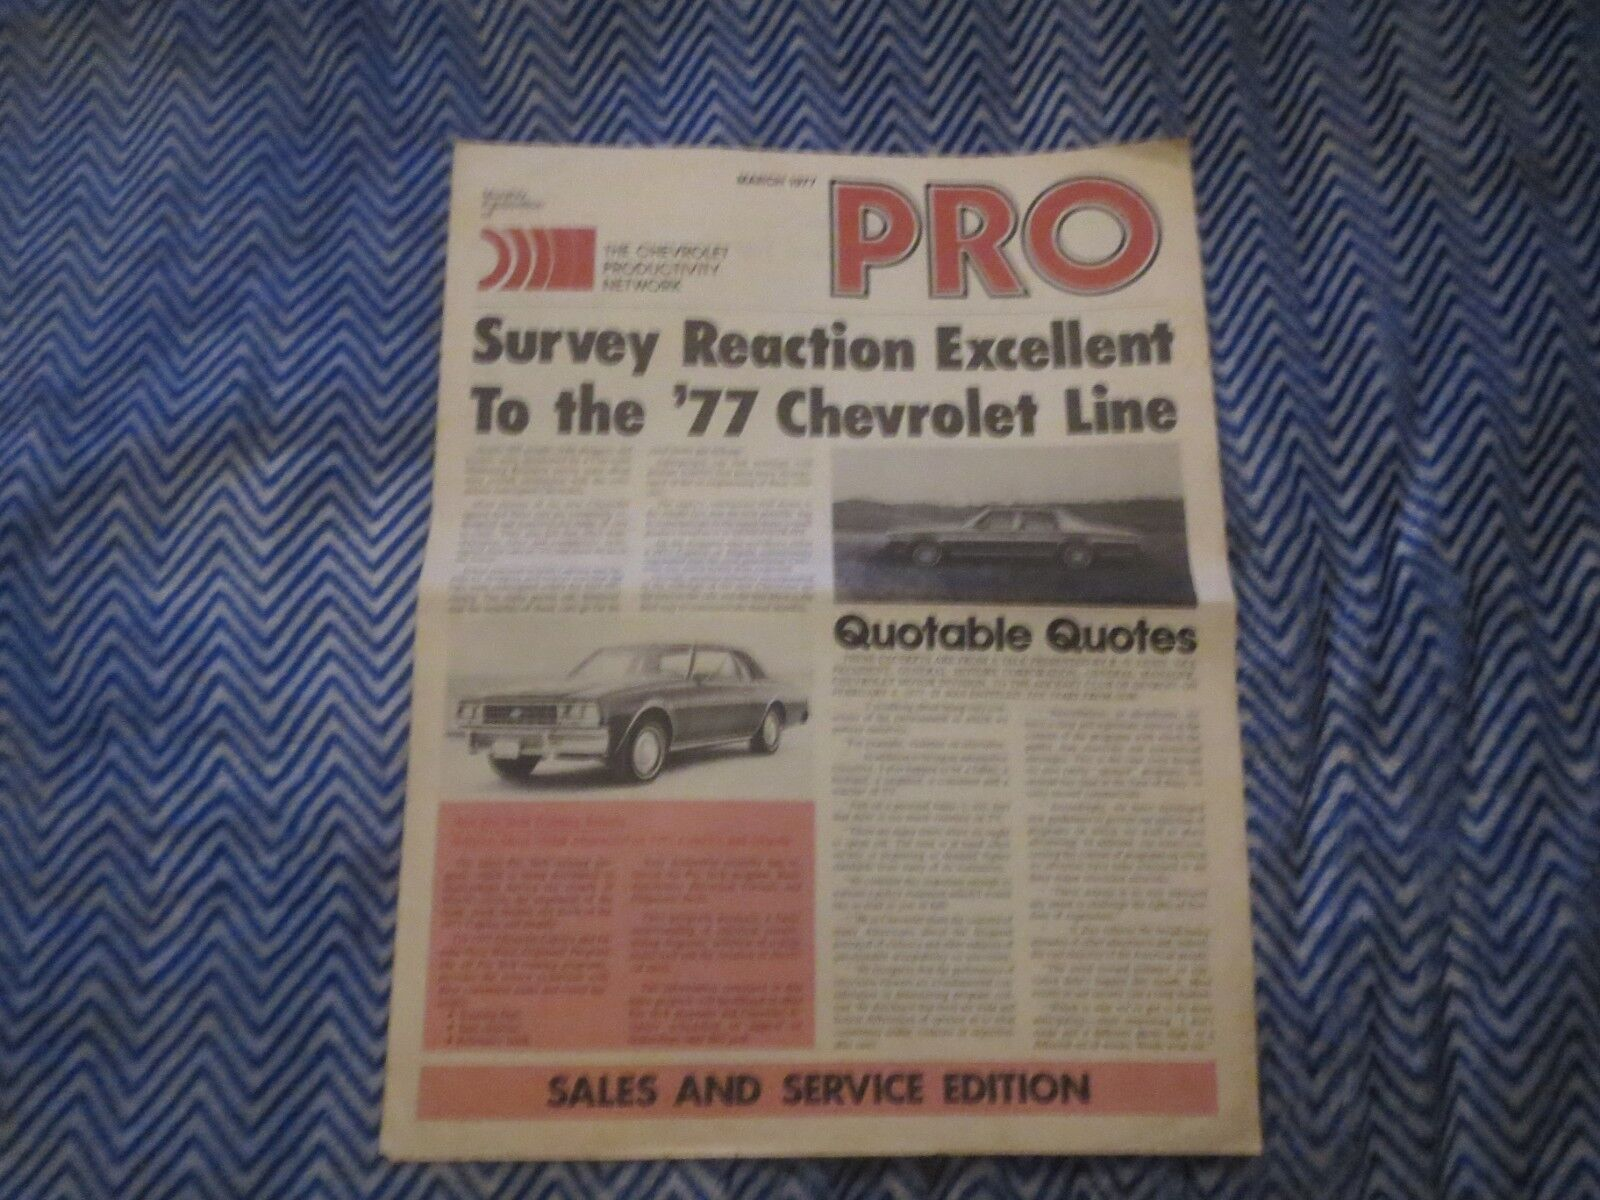 1977 CHEVROLET CAPRICE IMPALA AND STATION WAGONS PRO DEALER MAGAZINE BROCHURE